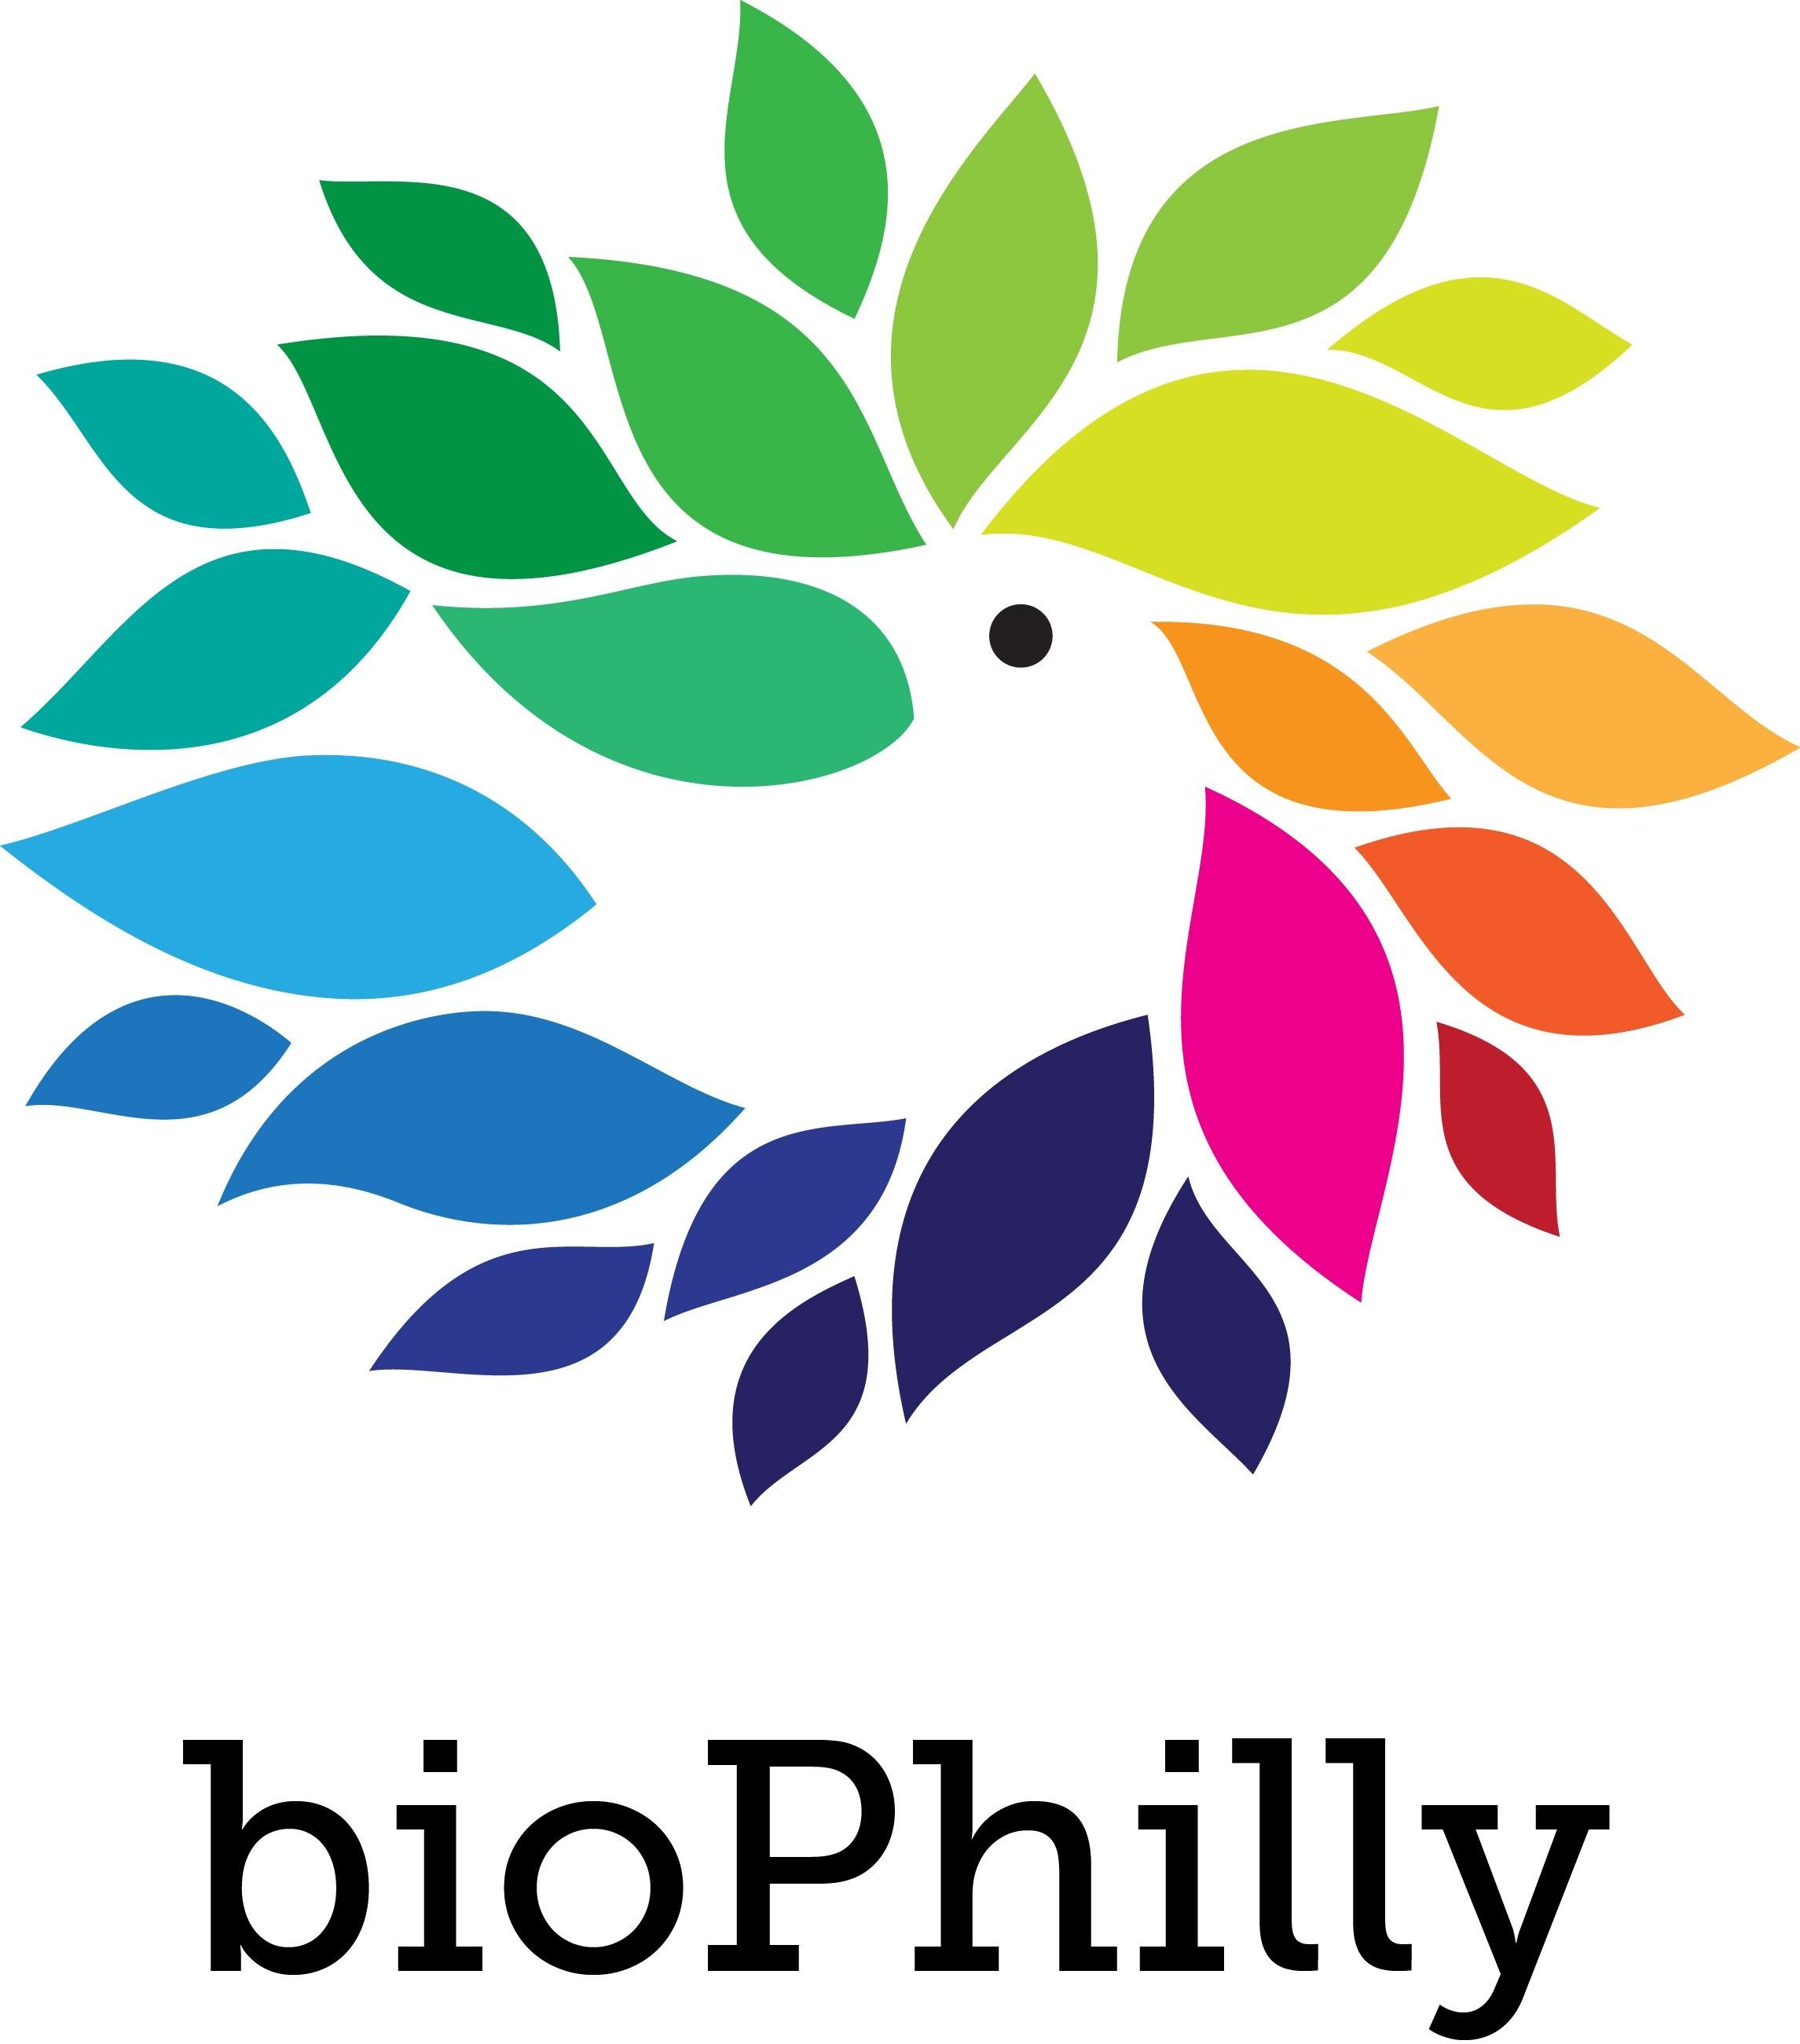 biophilly+logo.jpg